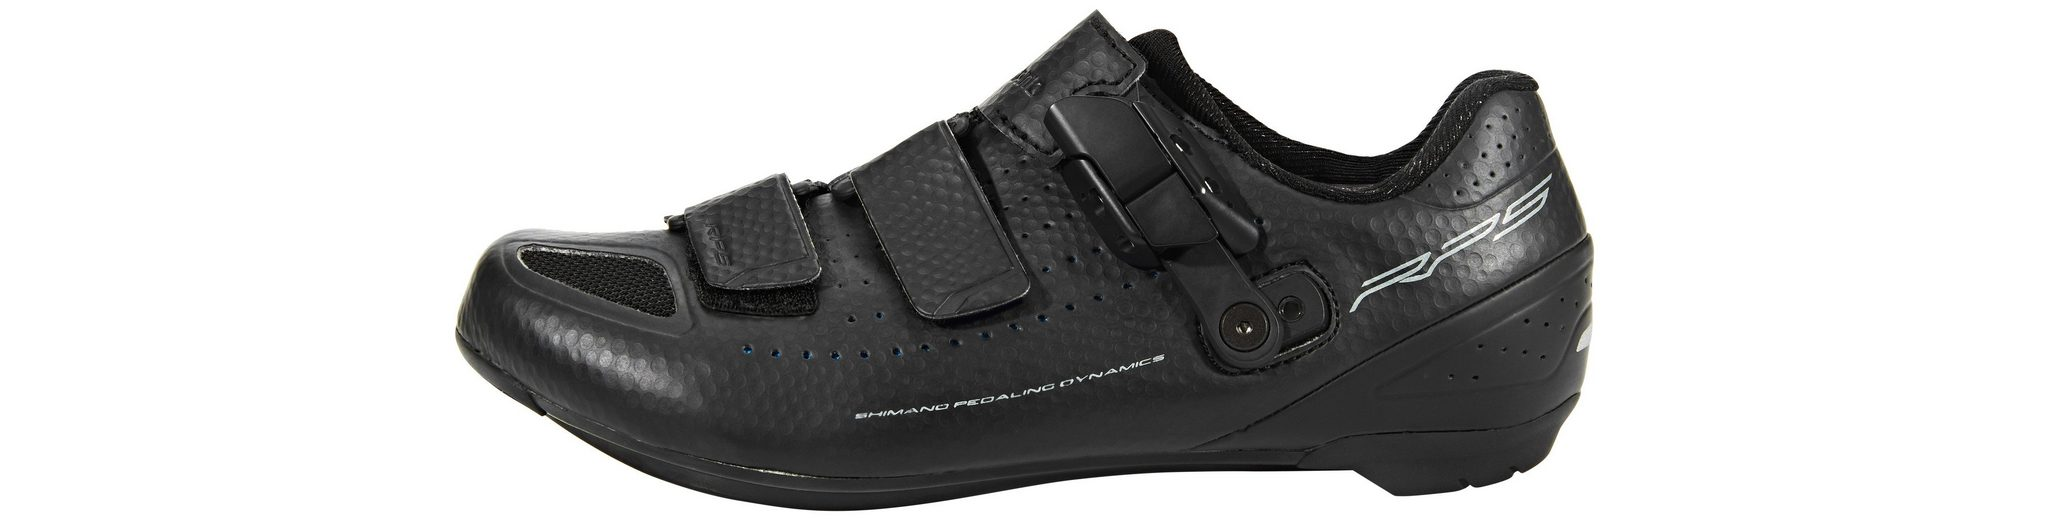 Shimano Fahrradschuhe SH-RP5L Schuhe Unisex Billig Verkaufen Mode uM75w0SyeX